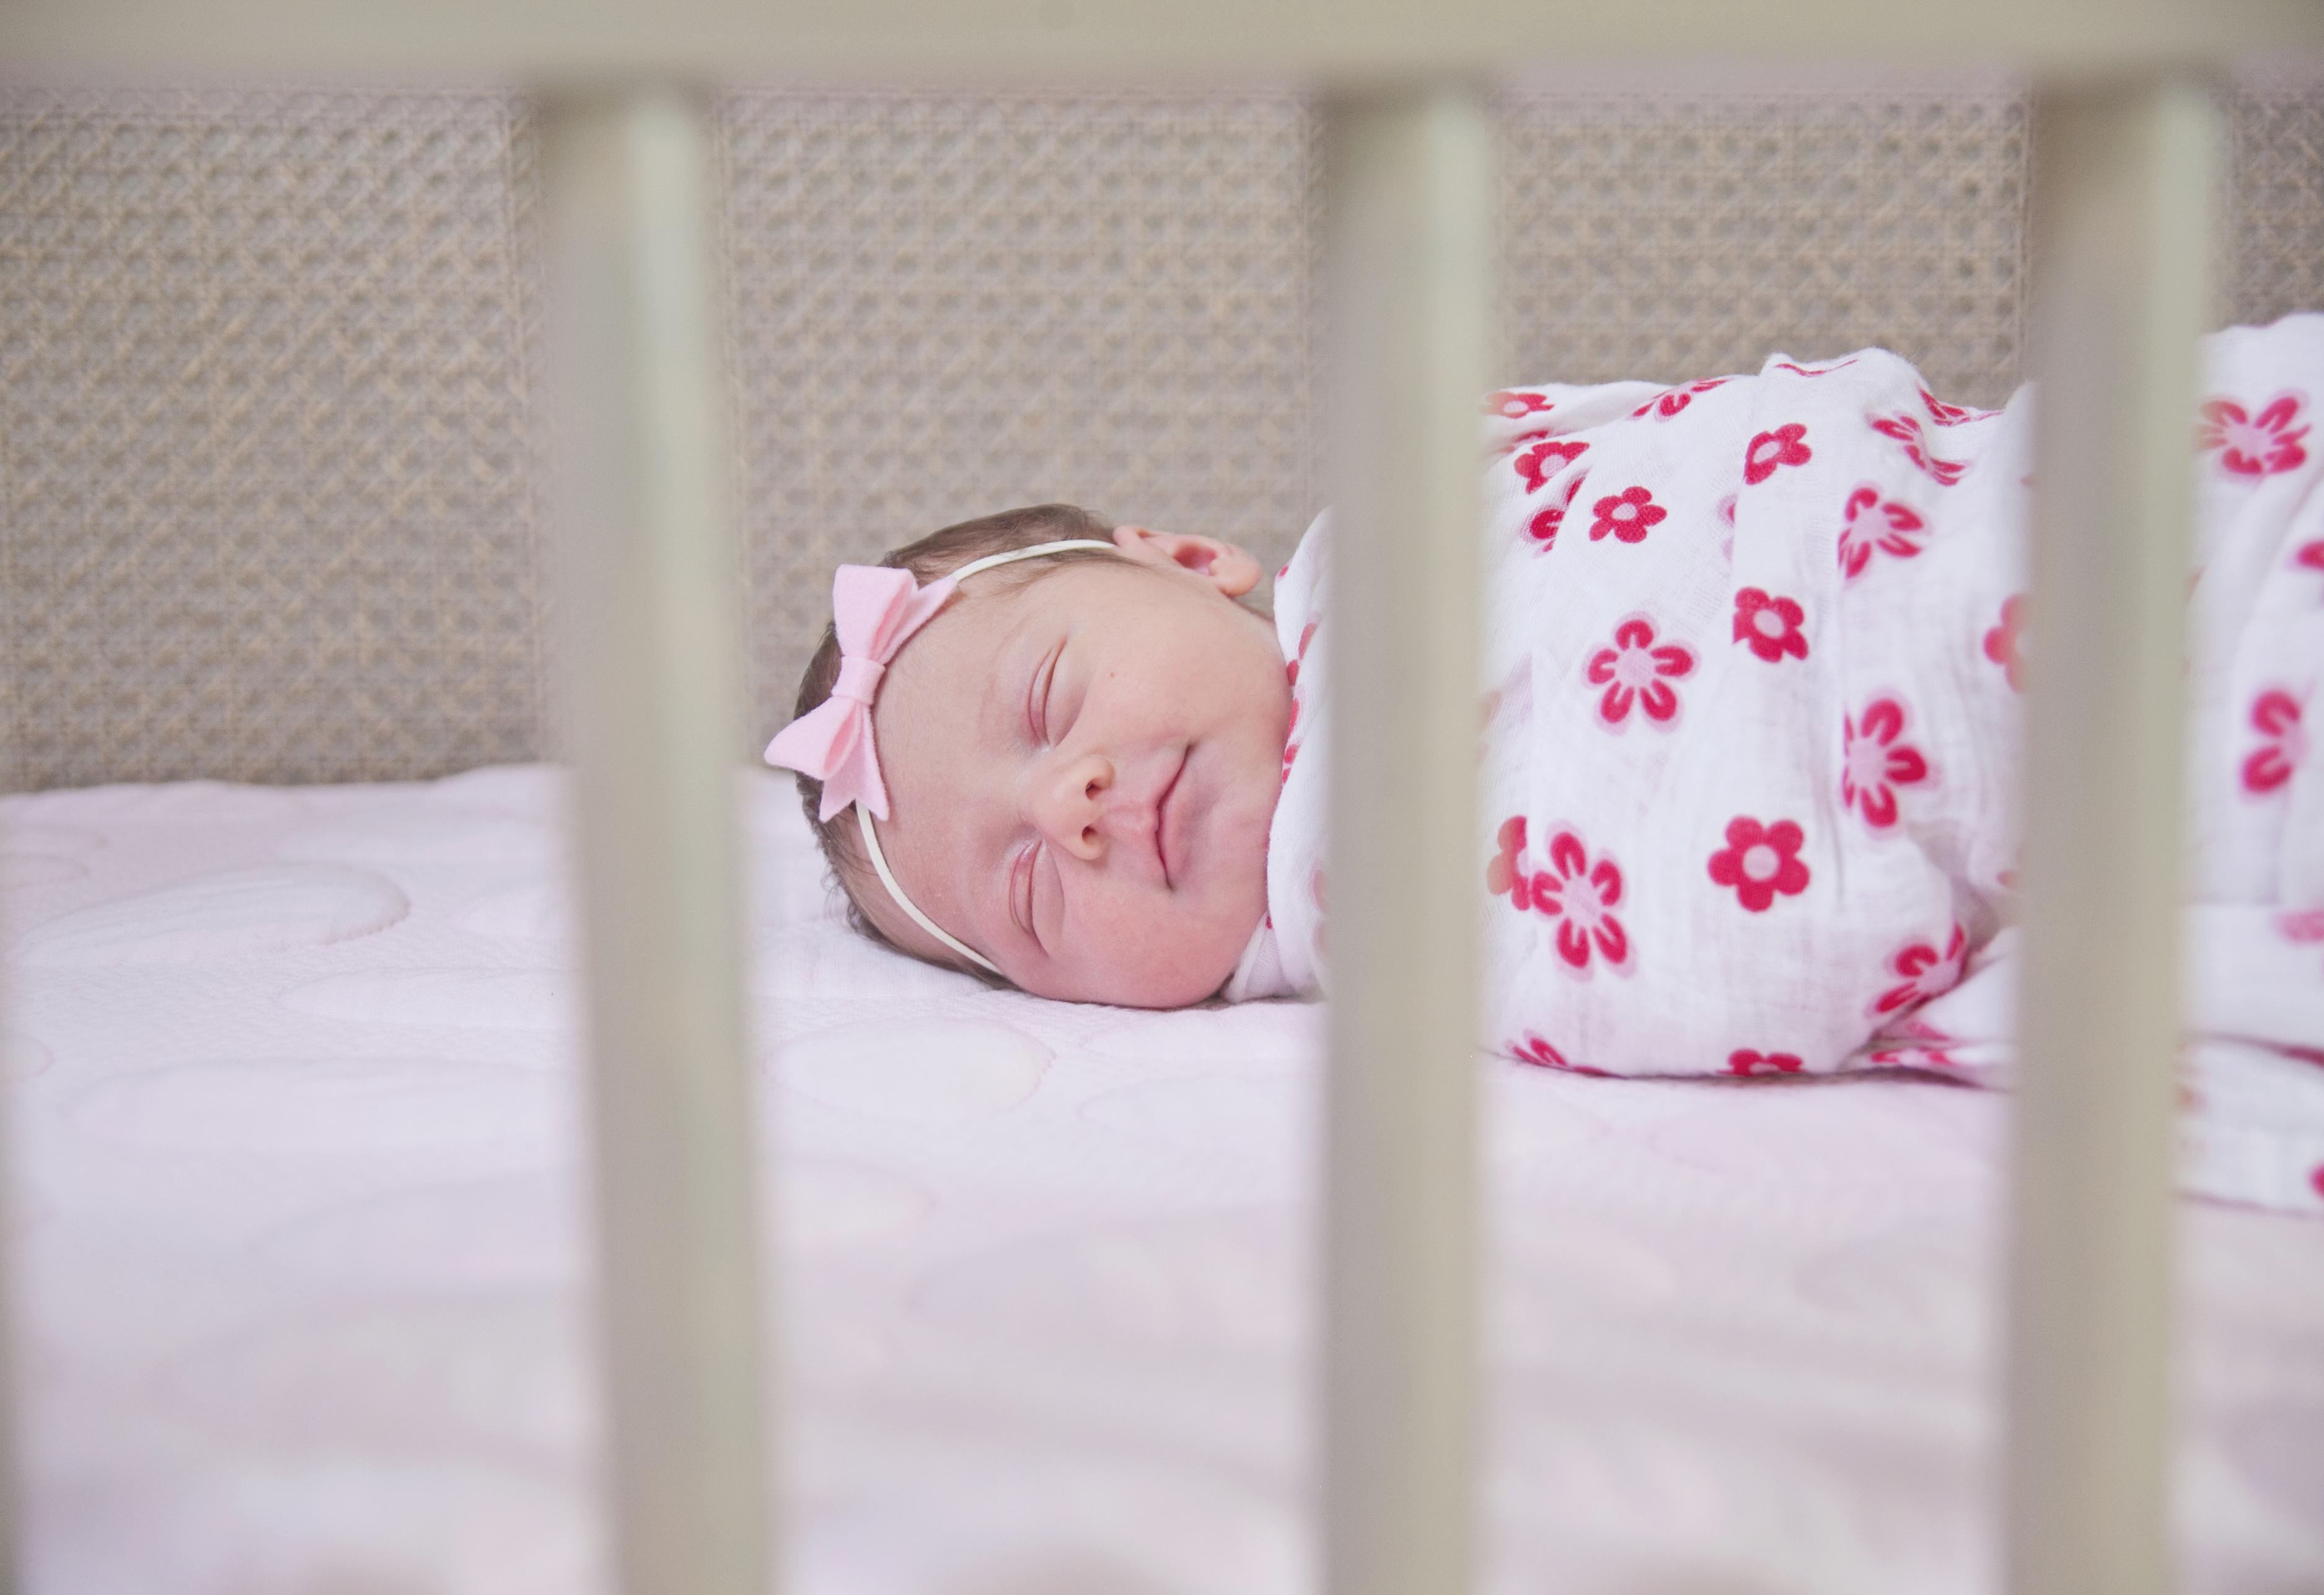 Baby crib mattress best - Baby Crib Mattress Best 23